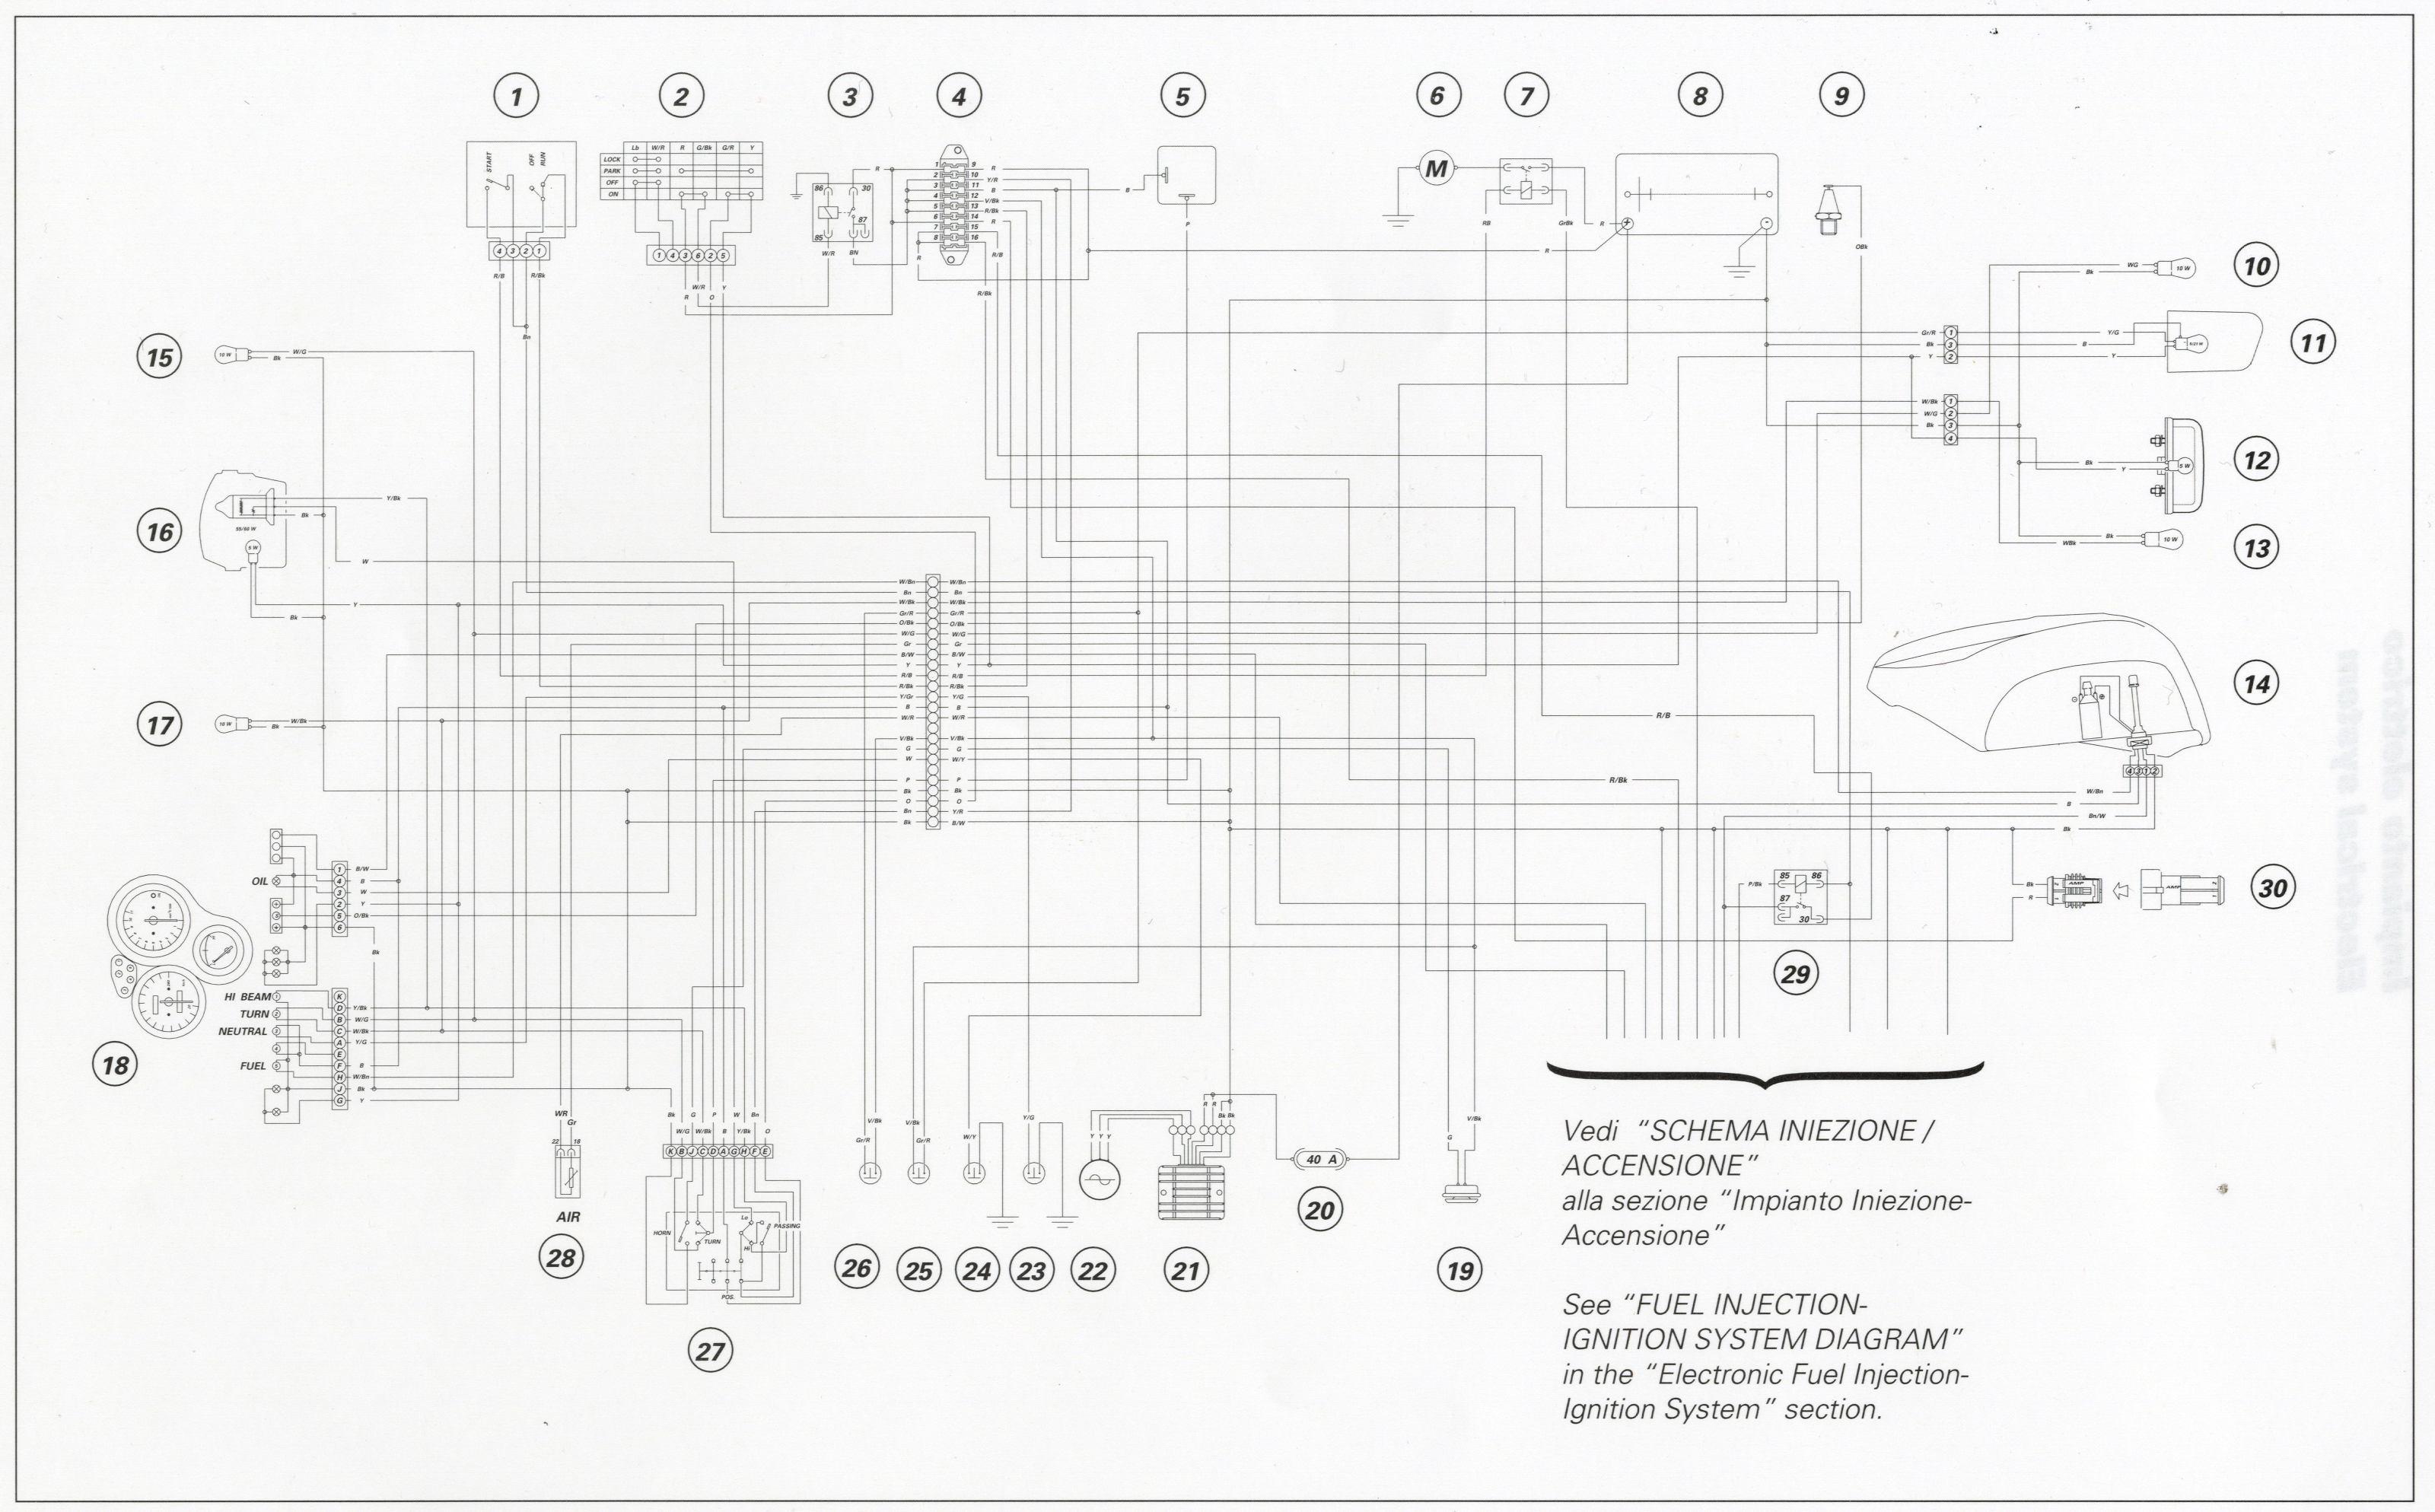 ducati 904 wiring diagram wiring diagram read Ducati 999 Wiring-Diagram